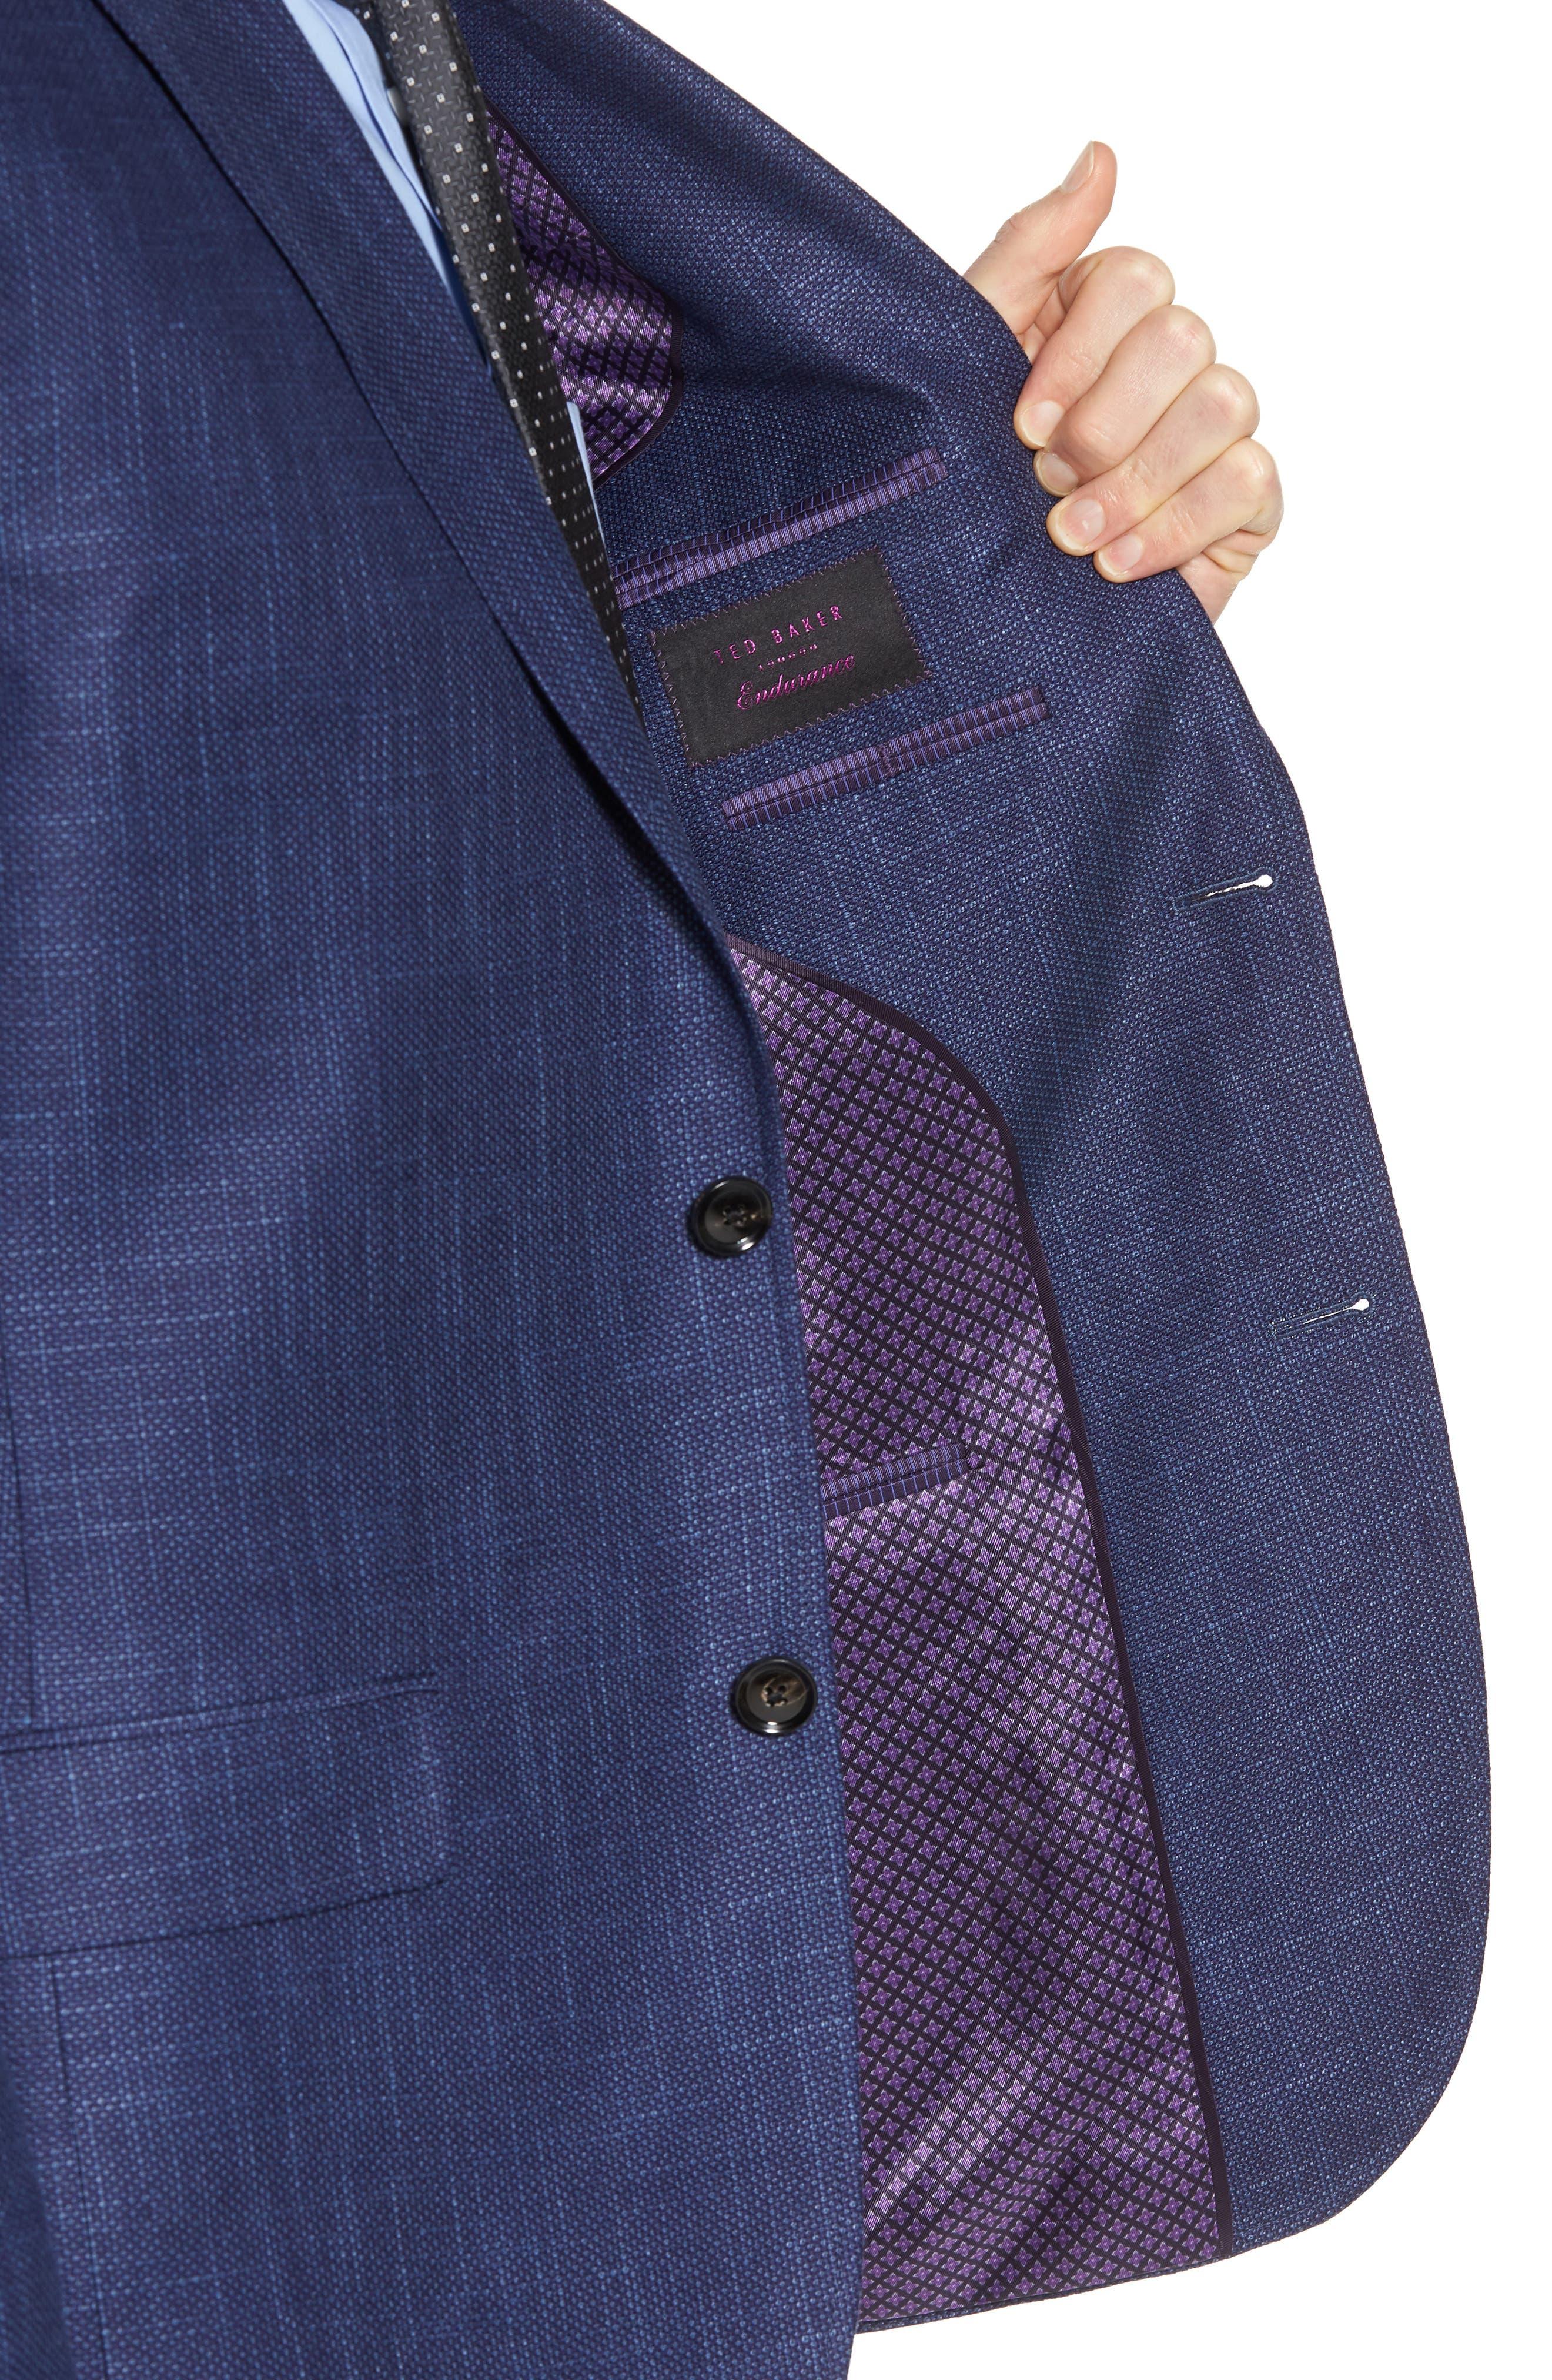 Jay Trim Fit Linen & Wool Blazer,                             Alternate thumbnail 4, color,                             Blue